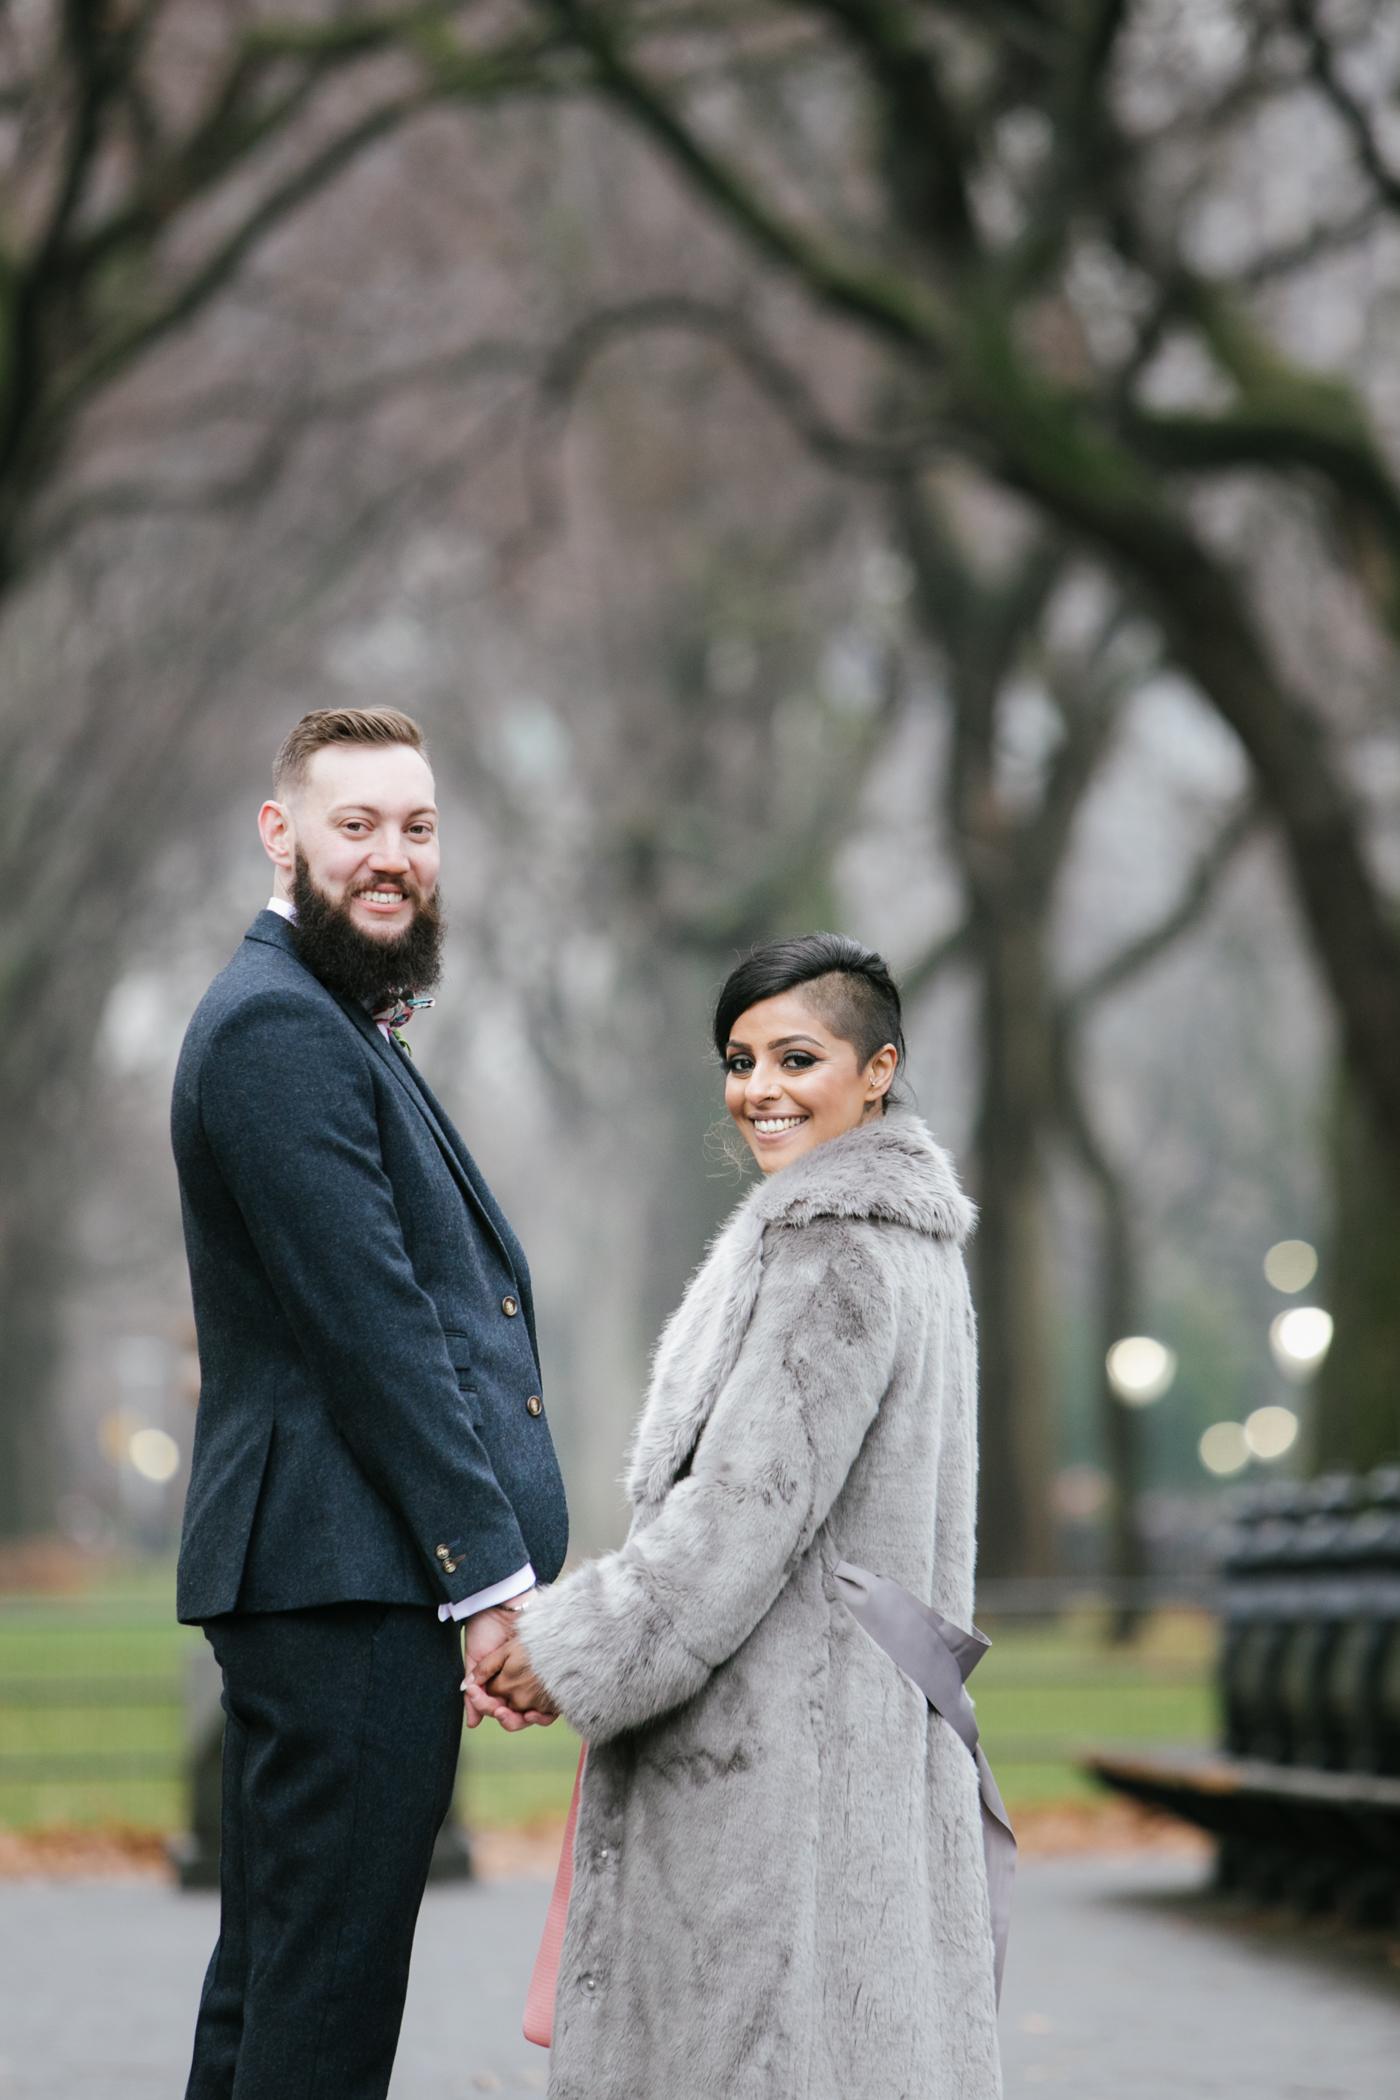 Central-park-wedding-by-Tanya-Isaeva-50.jpg